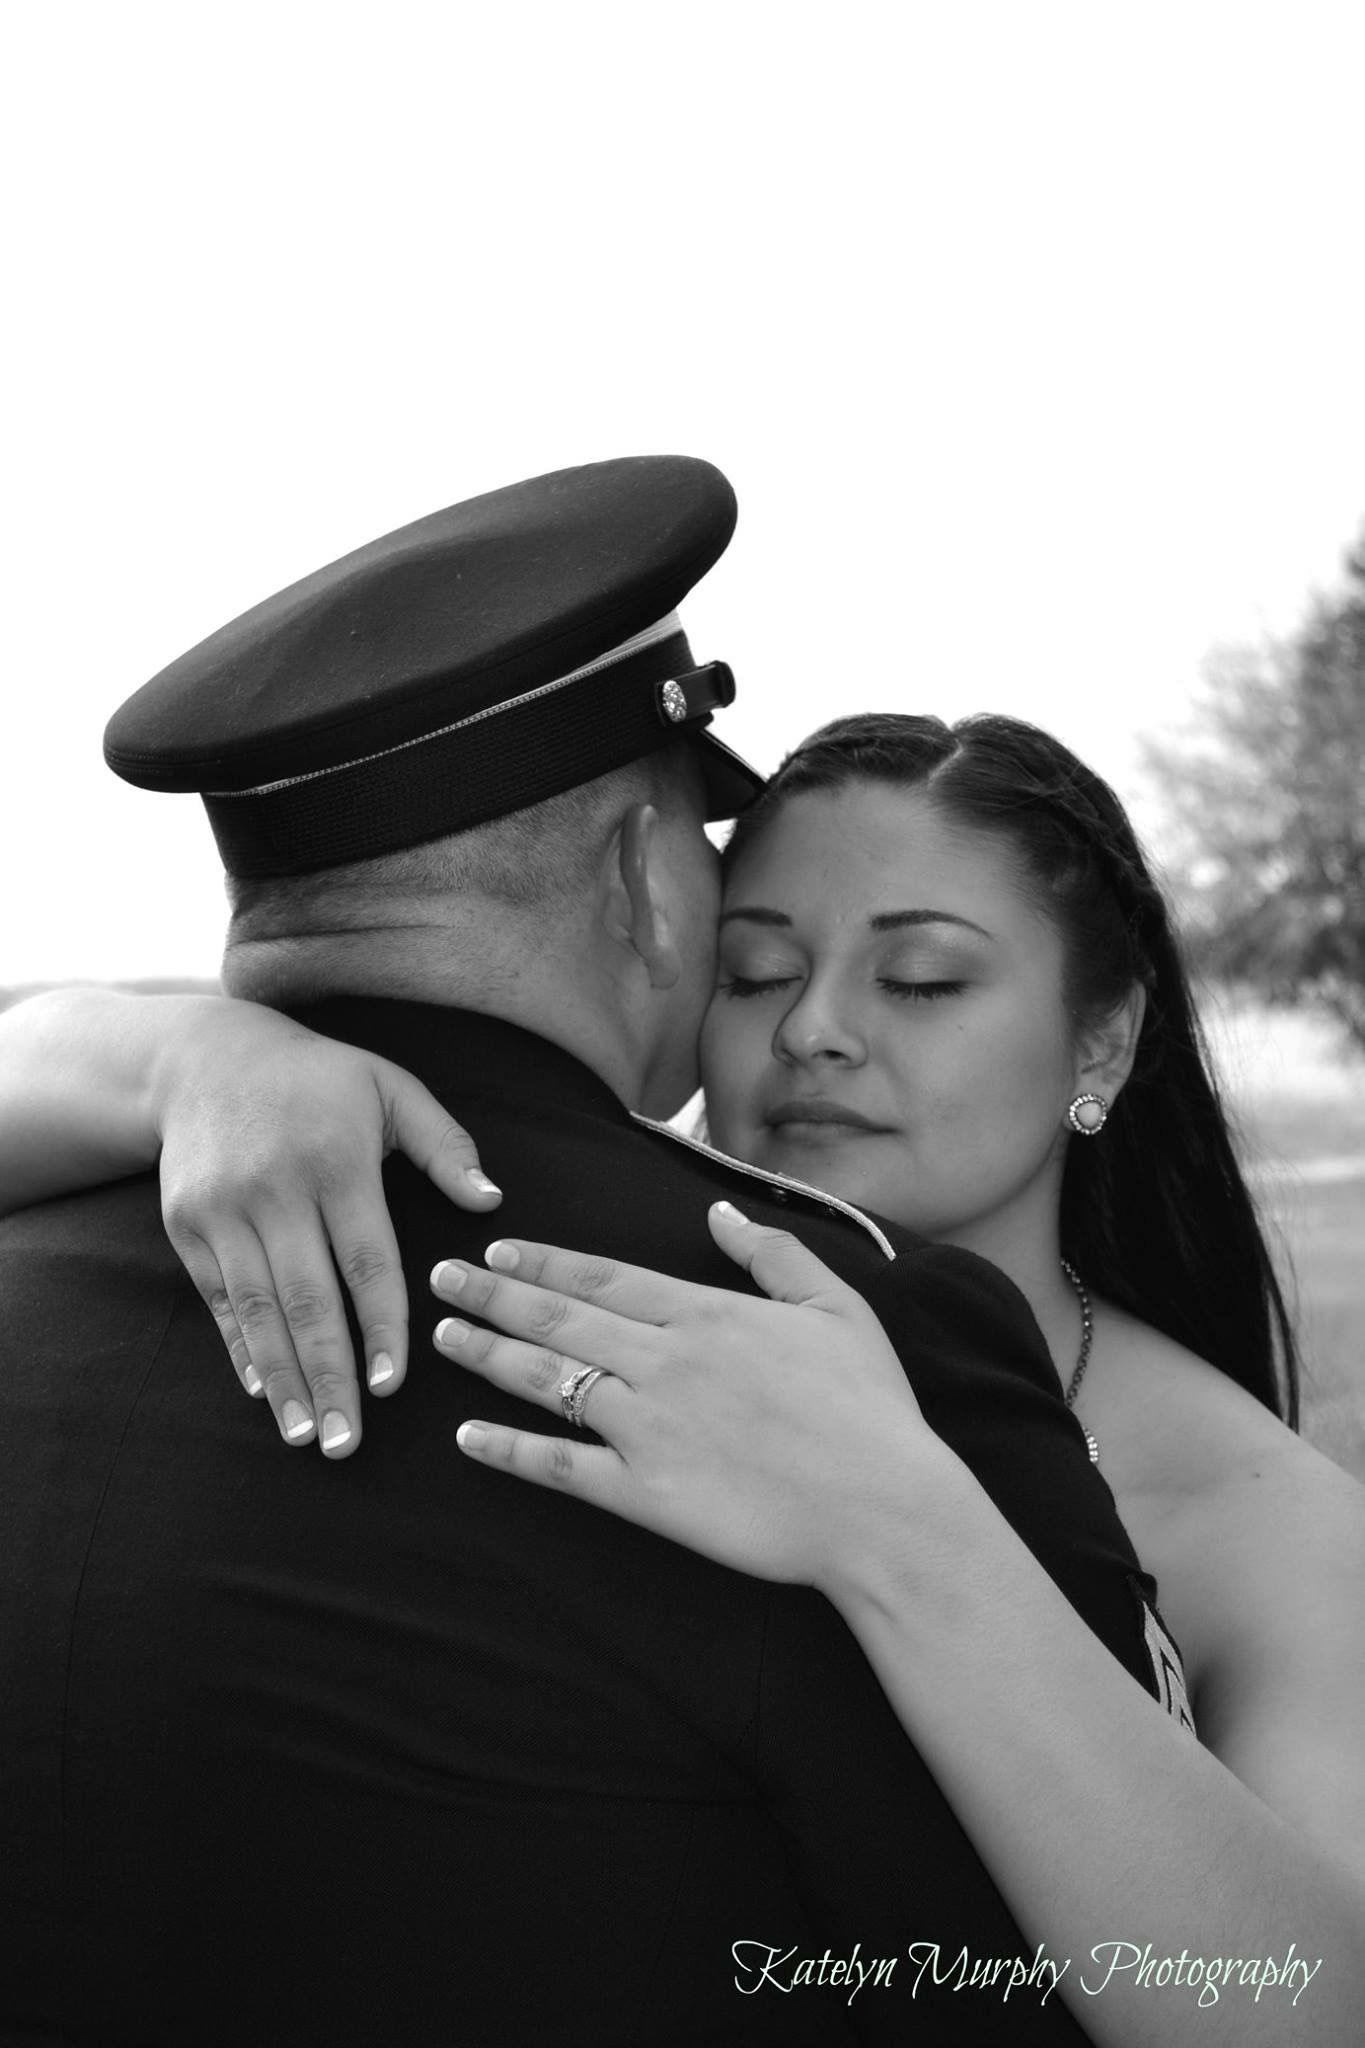 Black and white bride and groom #katelynmurphyphotography